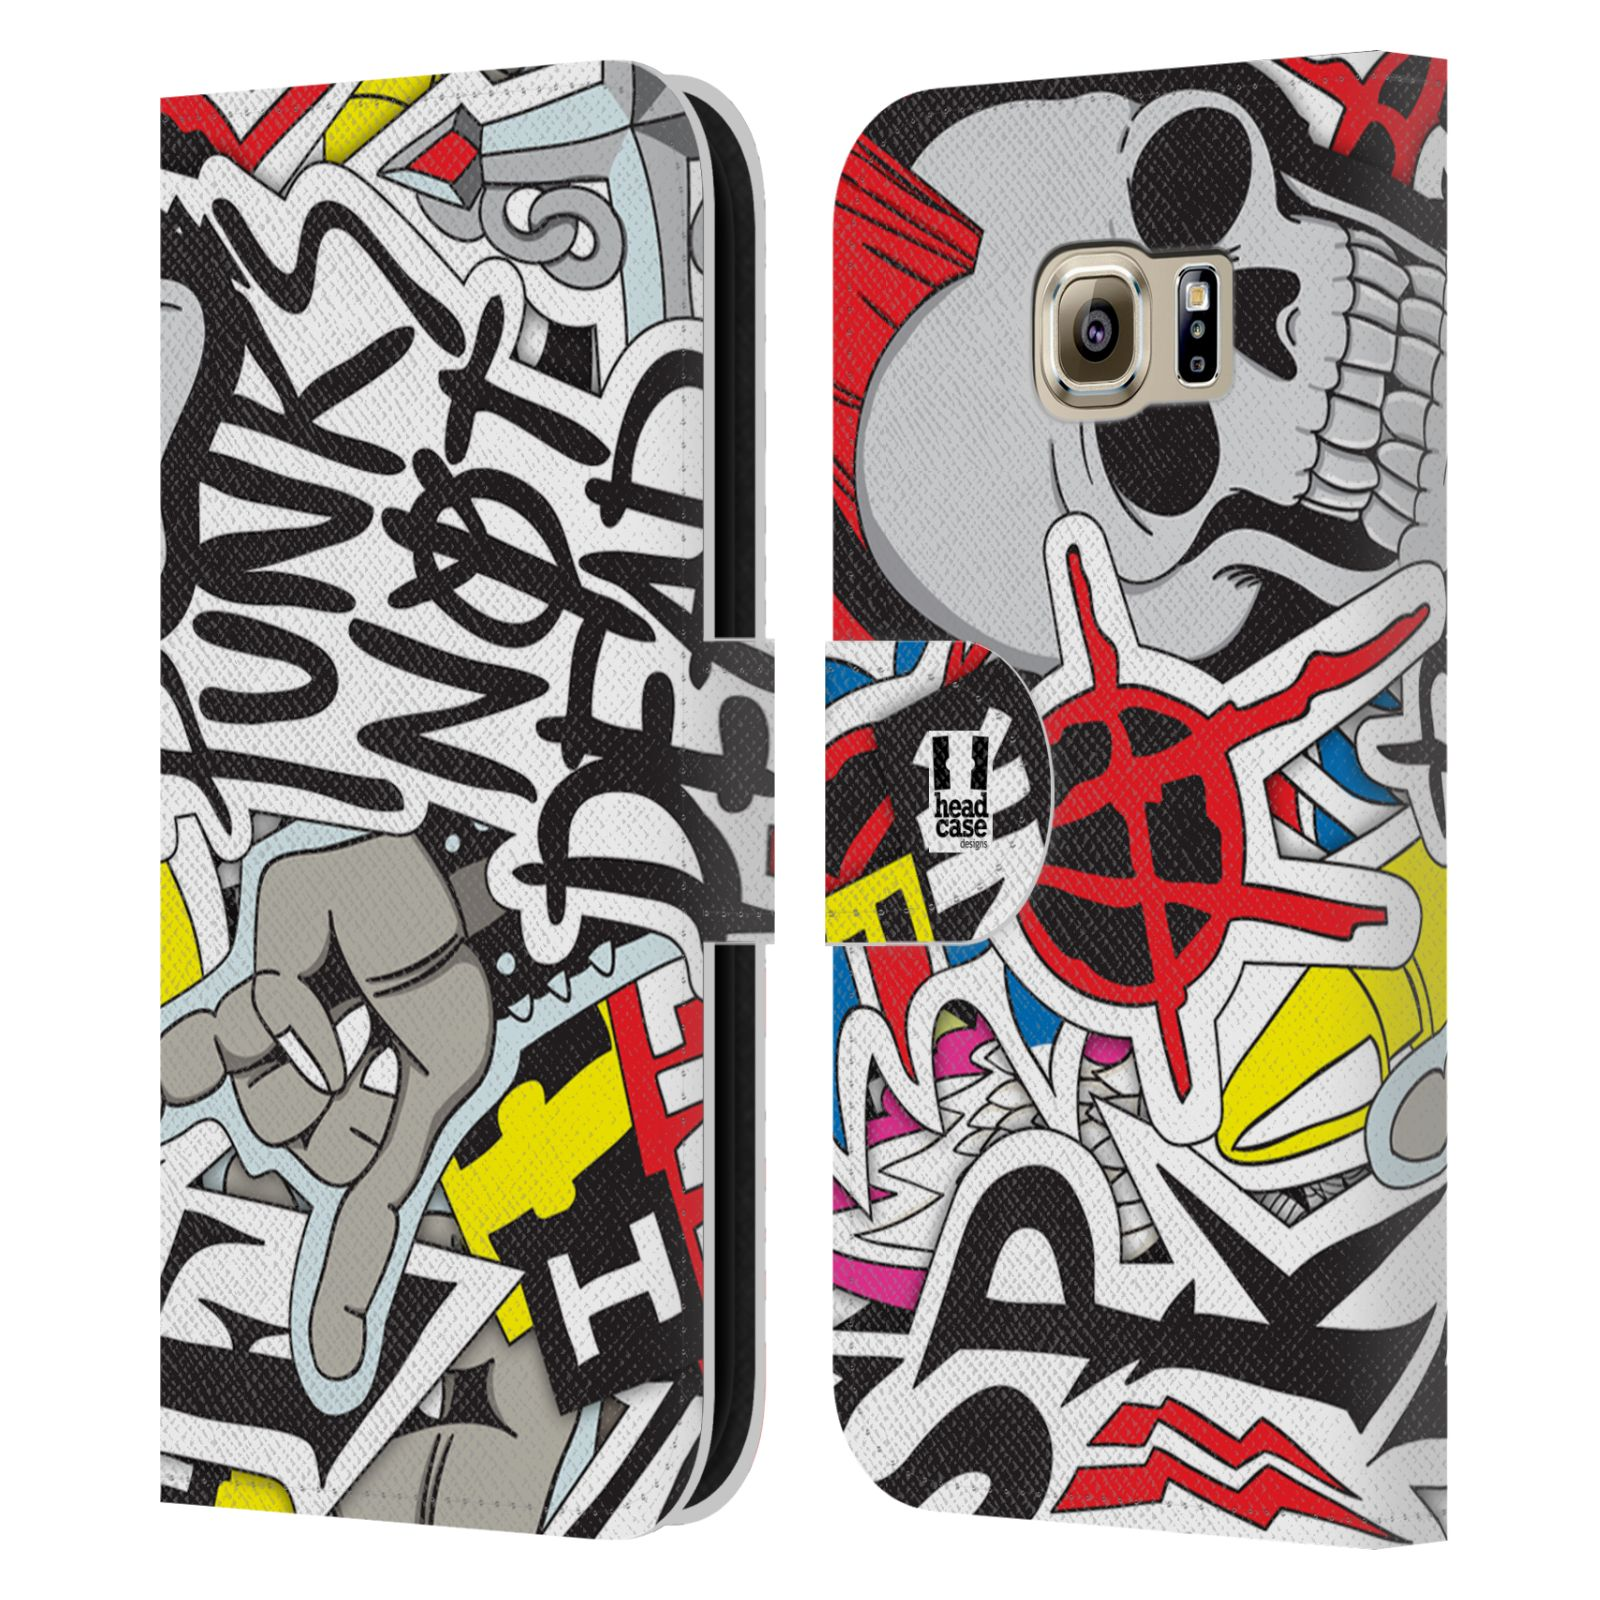 HEAD CASE Flipové pouzdro pro mobil Samsung Galaxy S6 (G9200) vzor STICKER nálepky PUNK IS NOT DEAD